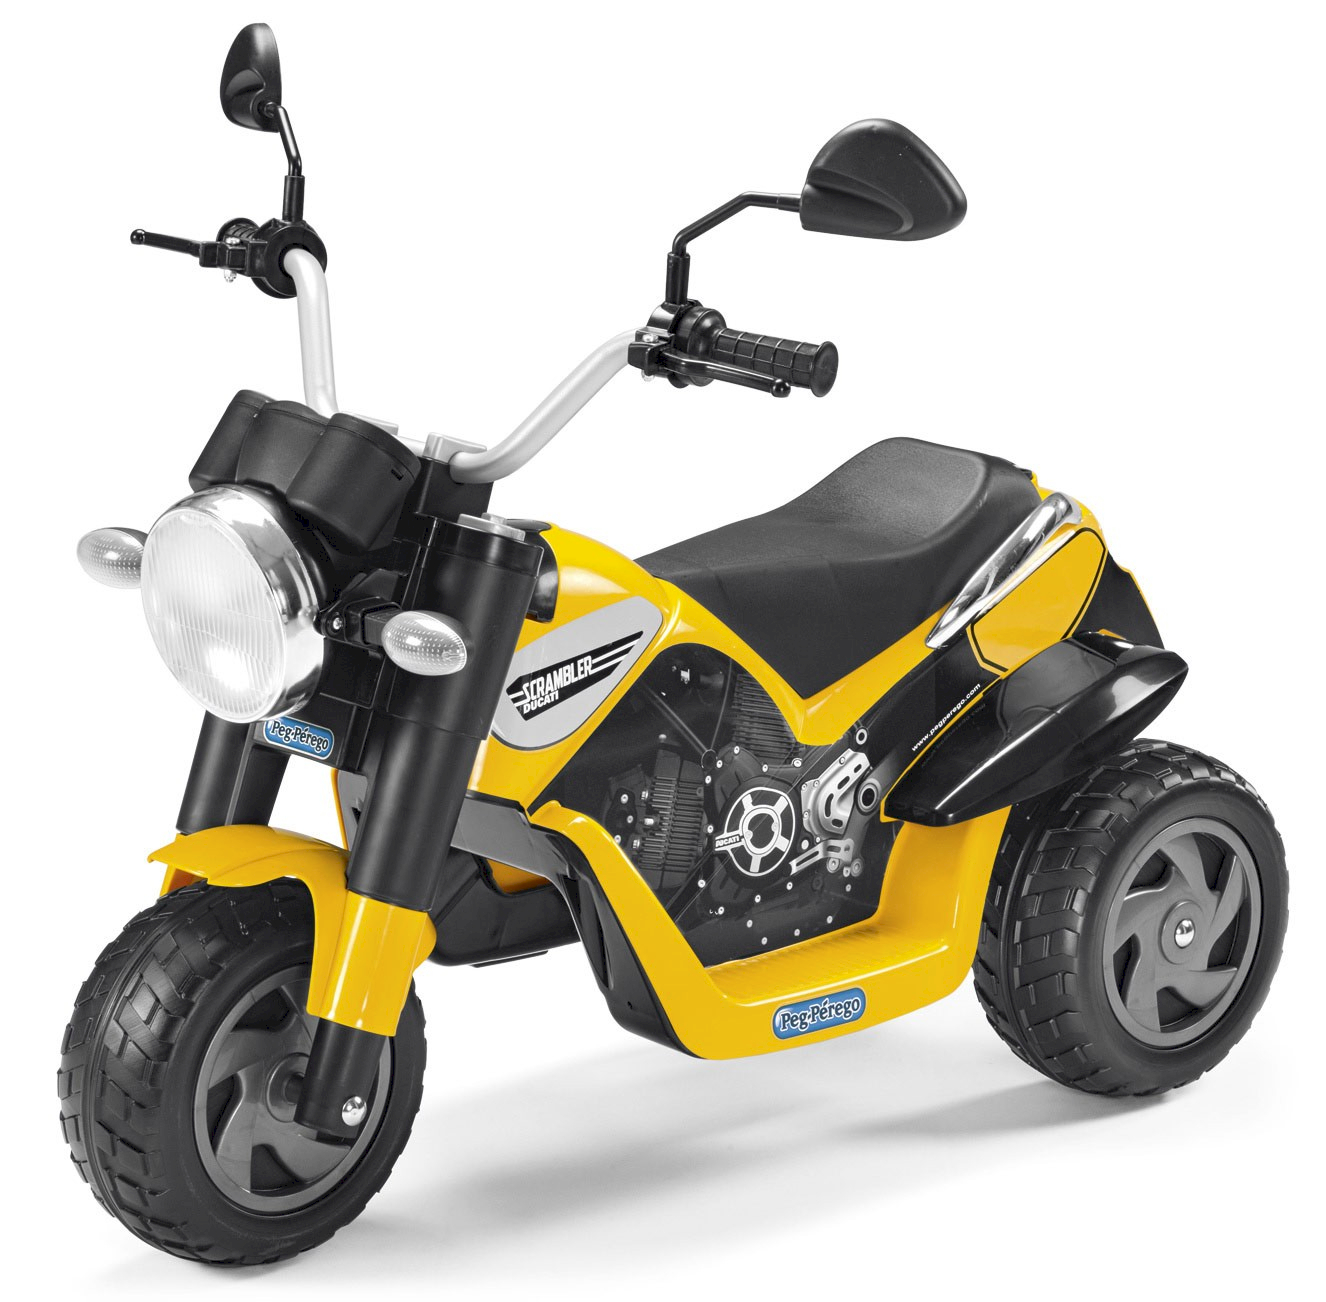 Peg Perego Mini Elektrische Motorrad Ducati Scrambler